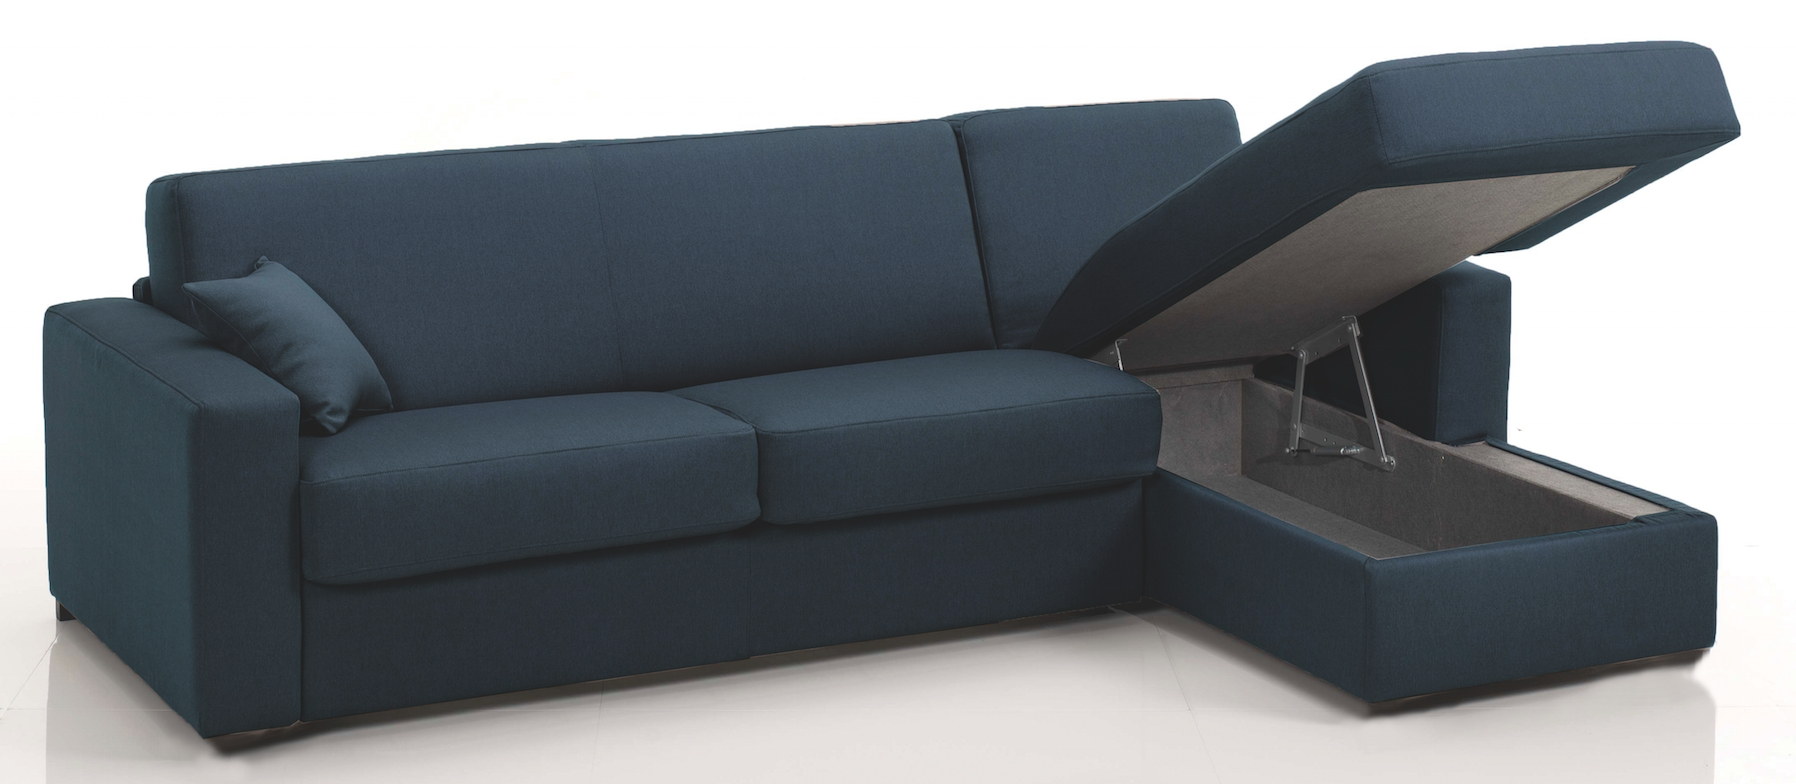 canap d angle convertible rapido r versible microfibre. Black Bedroom Furniture Sets. Home Design Ideas